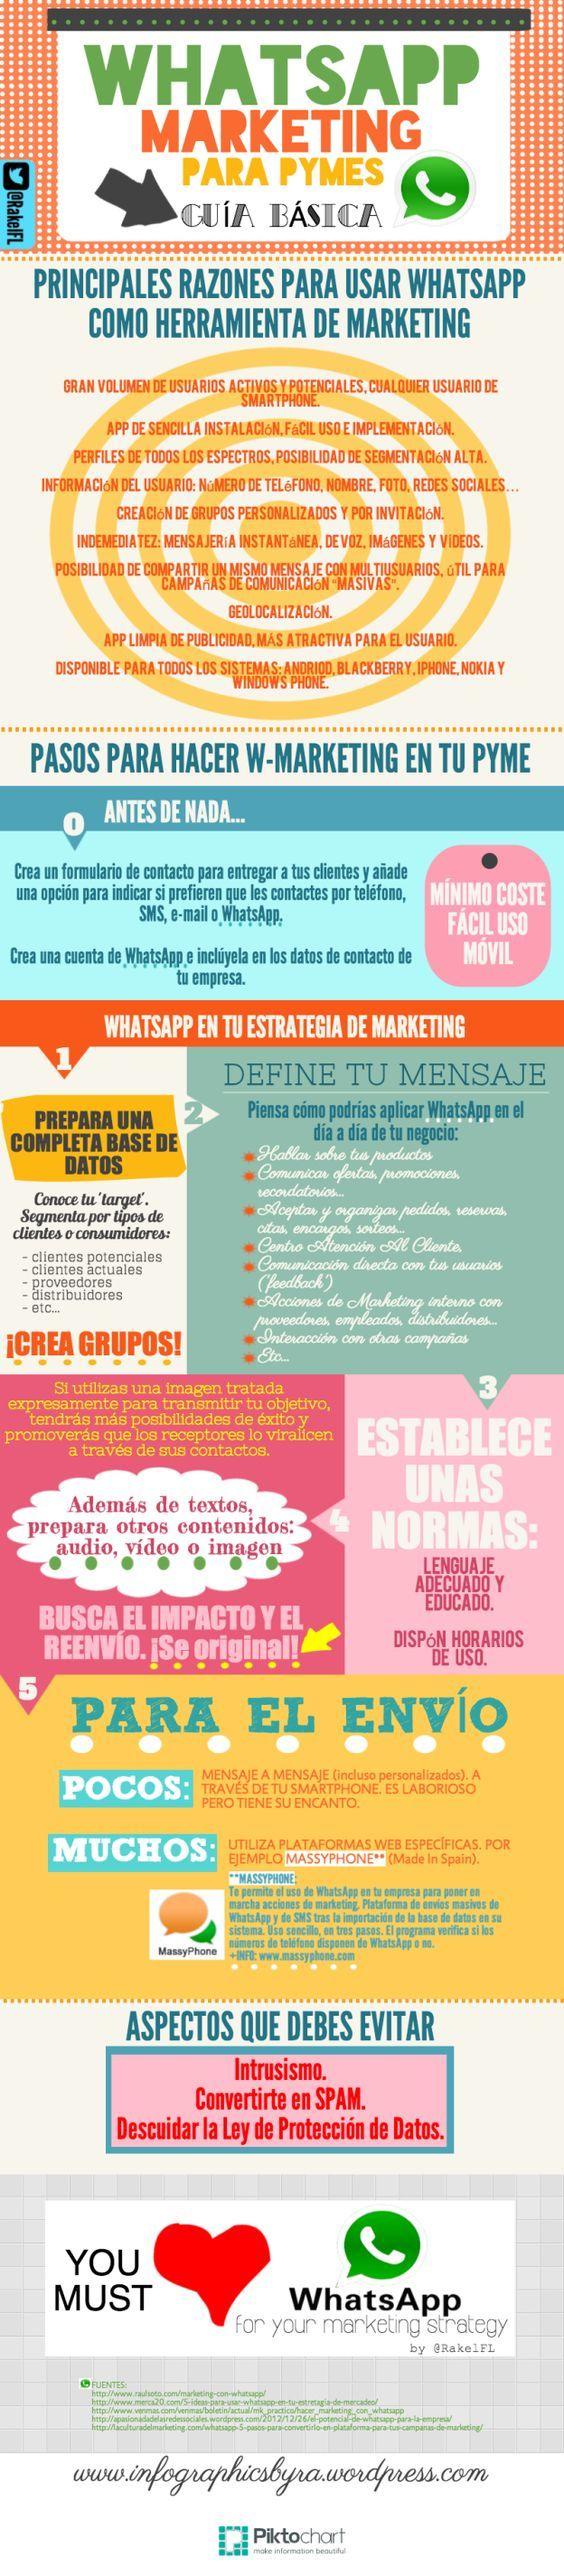 Uso de  WhatsApp para estrategias de Marketing de Pymes